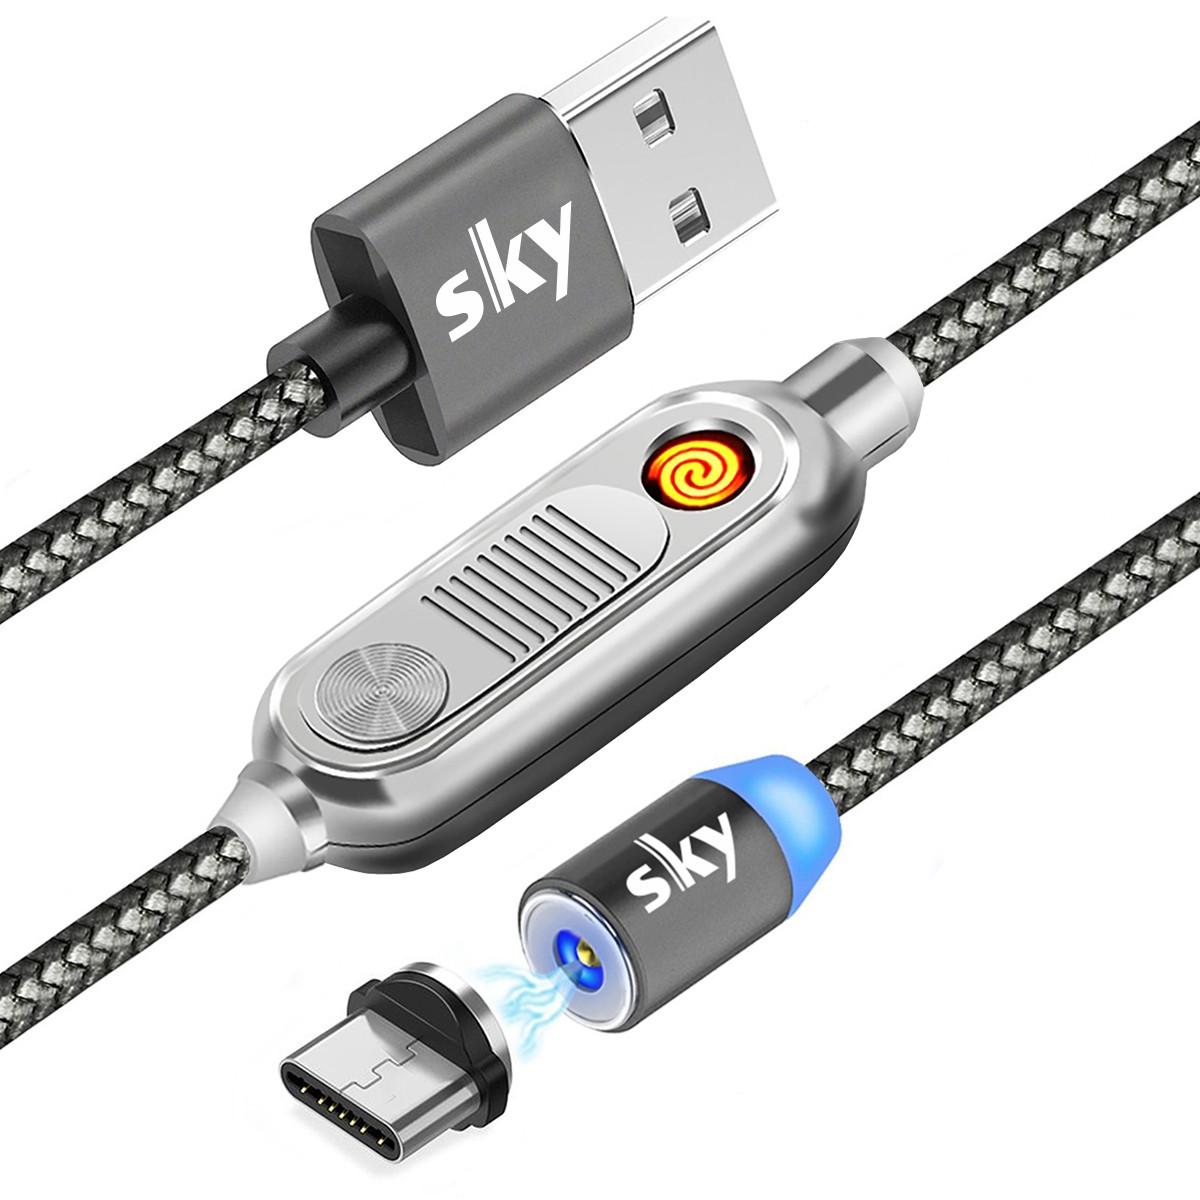 Кабель магнітний USB SKY з прикурювачем (R ZIP-line) Type-C (120 см) Grey